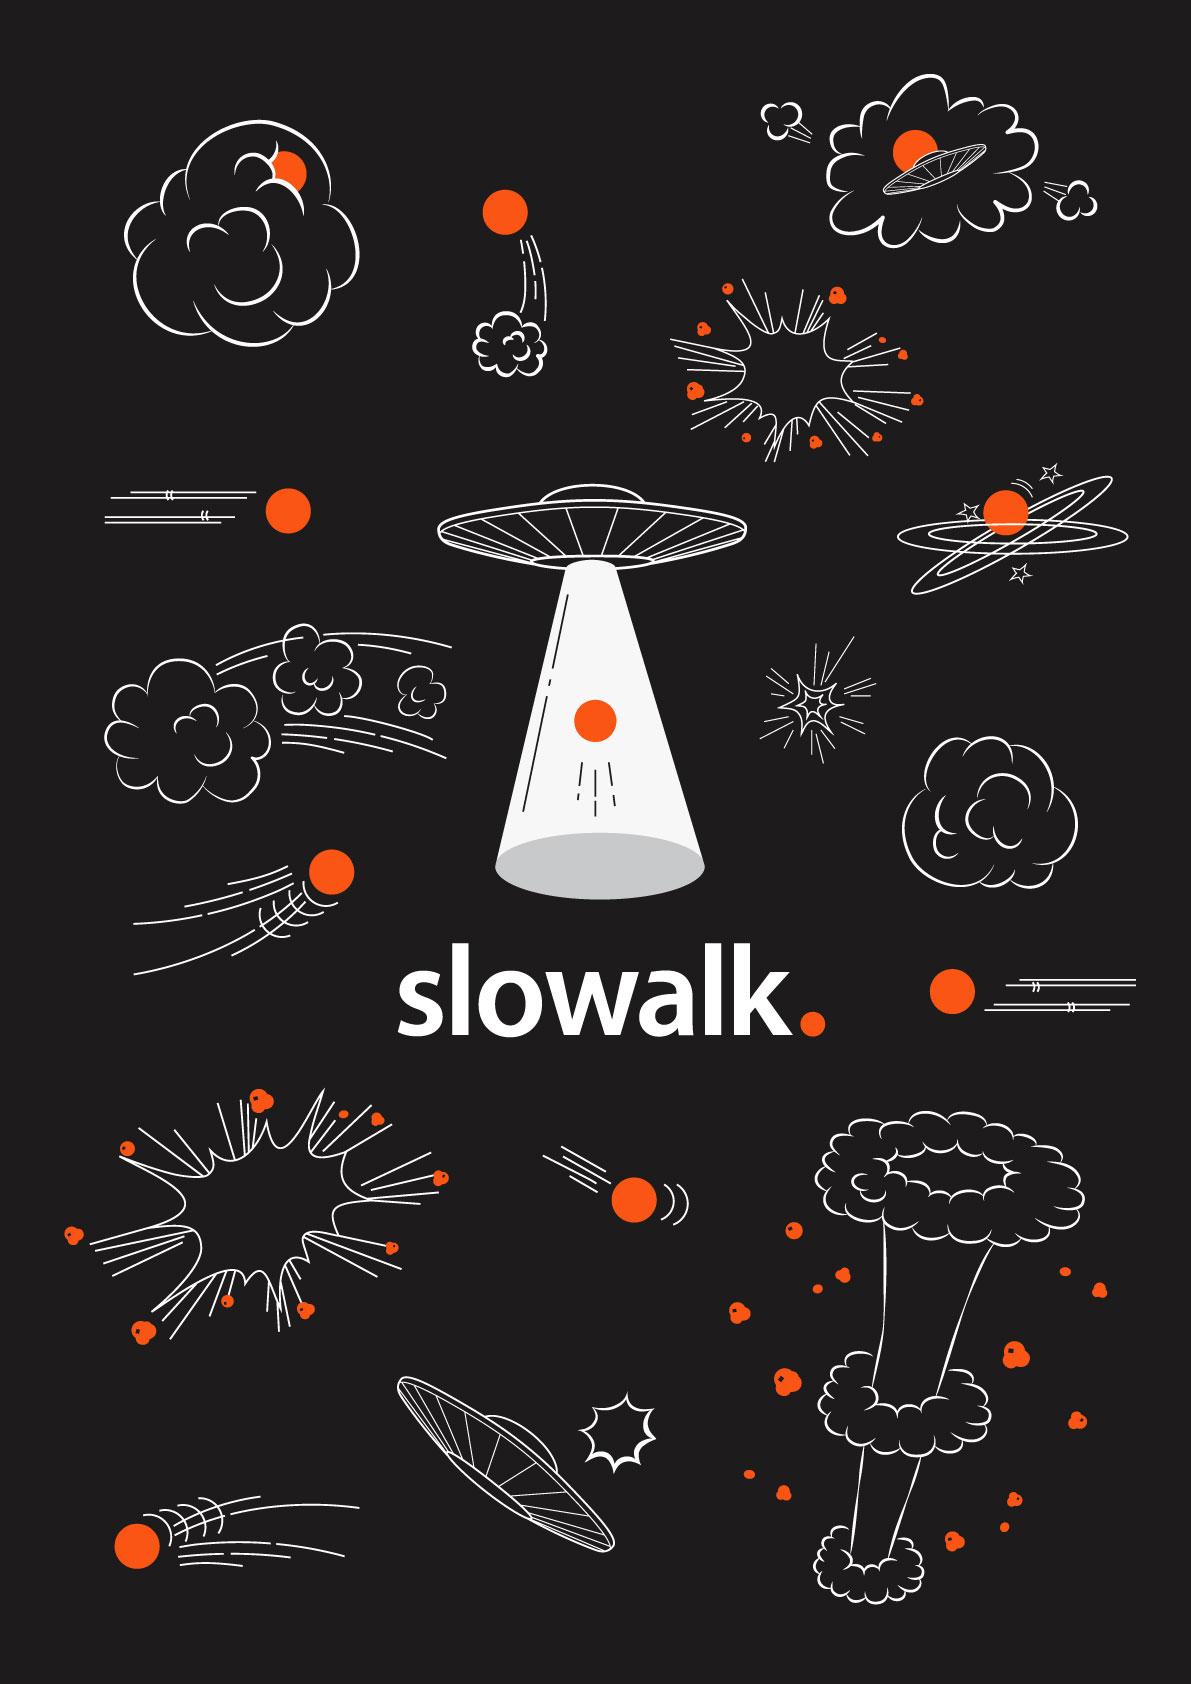 Slowalk-poster-20170413